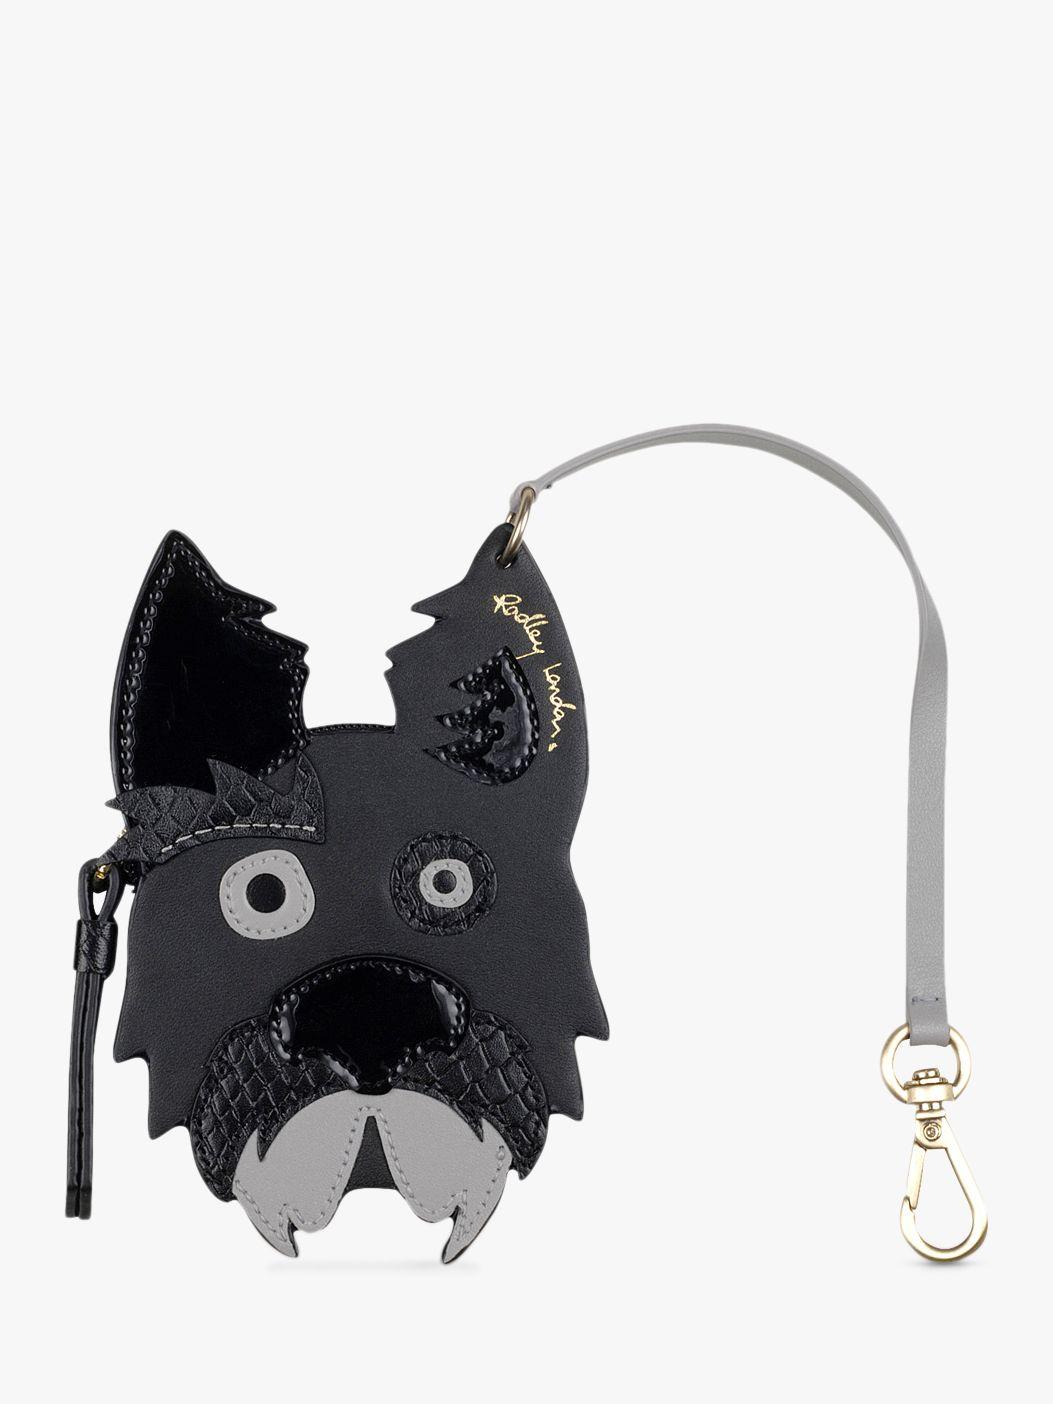 Radley Radley & Friends Leather Scottie Dog Bag Charm, Black